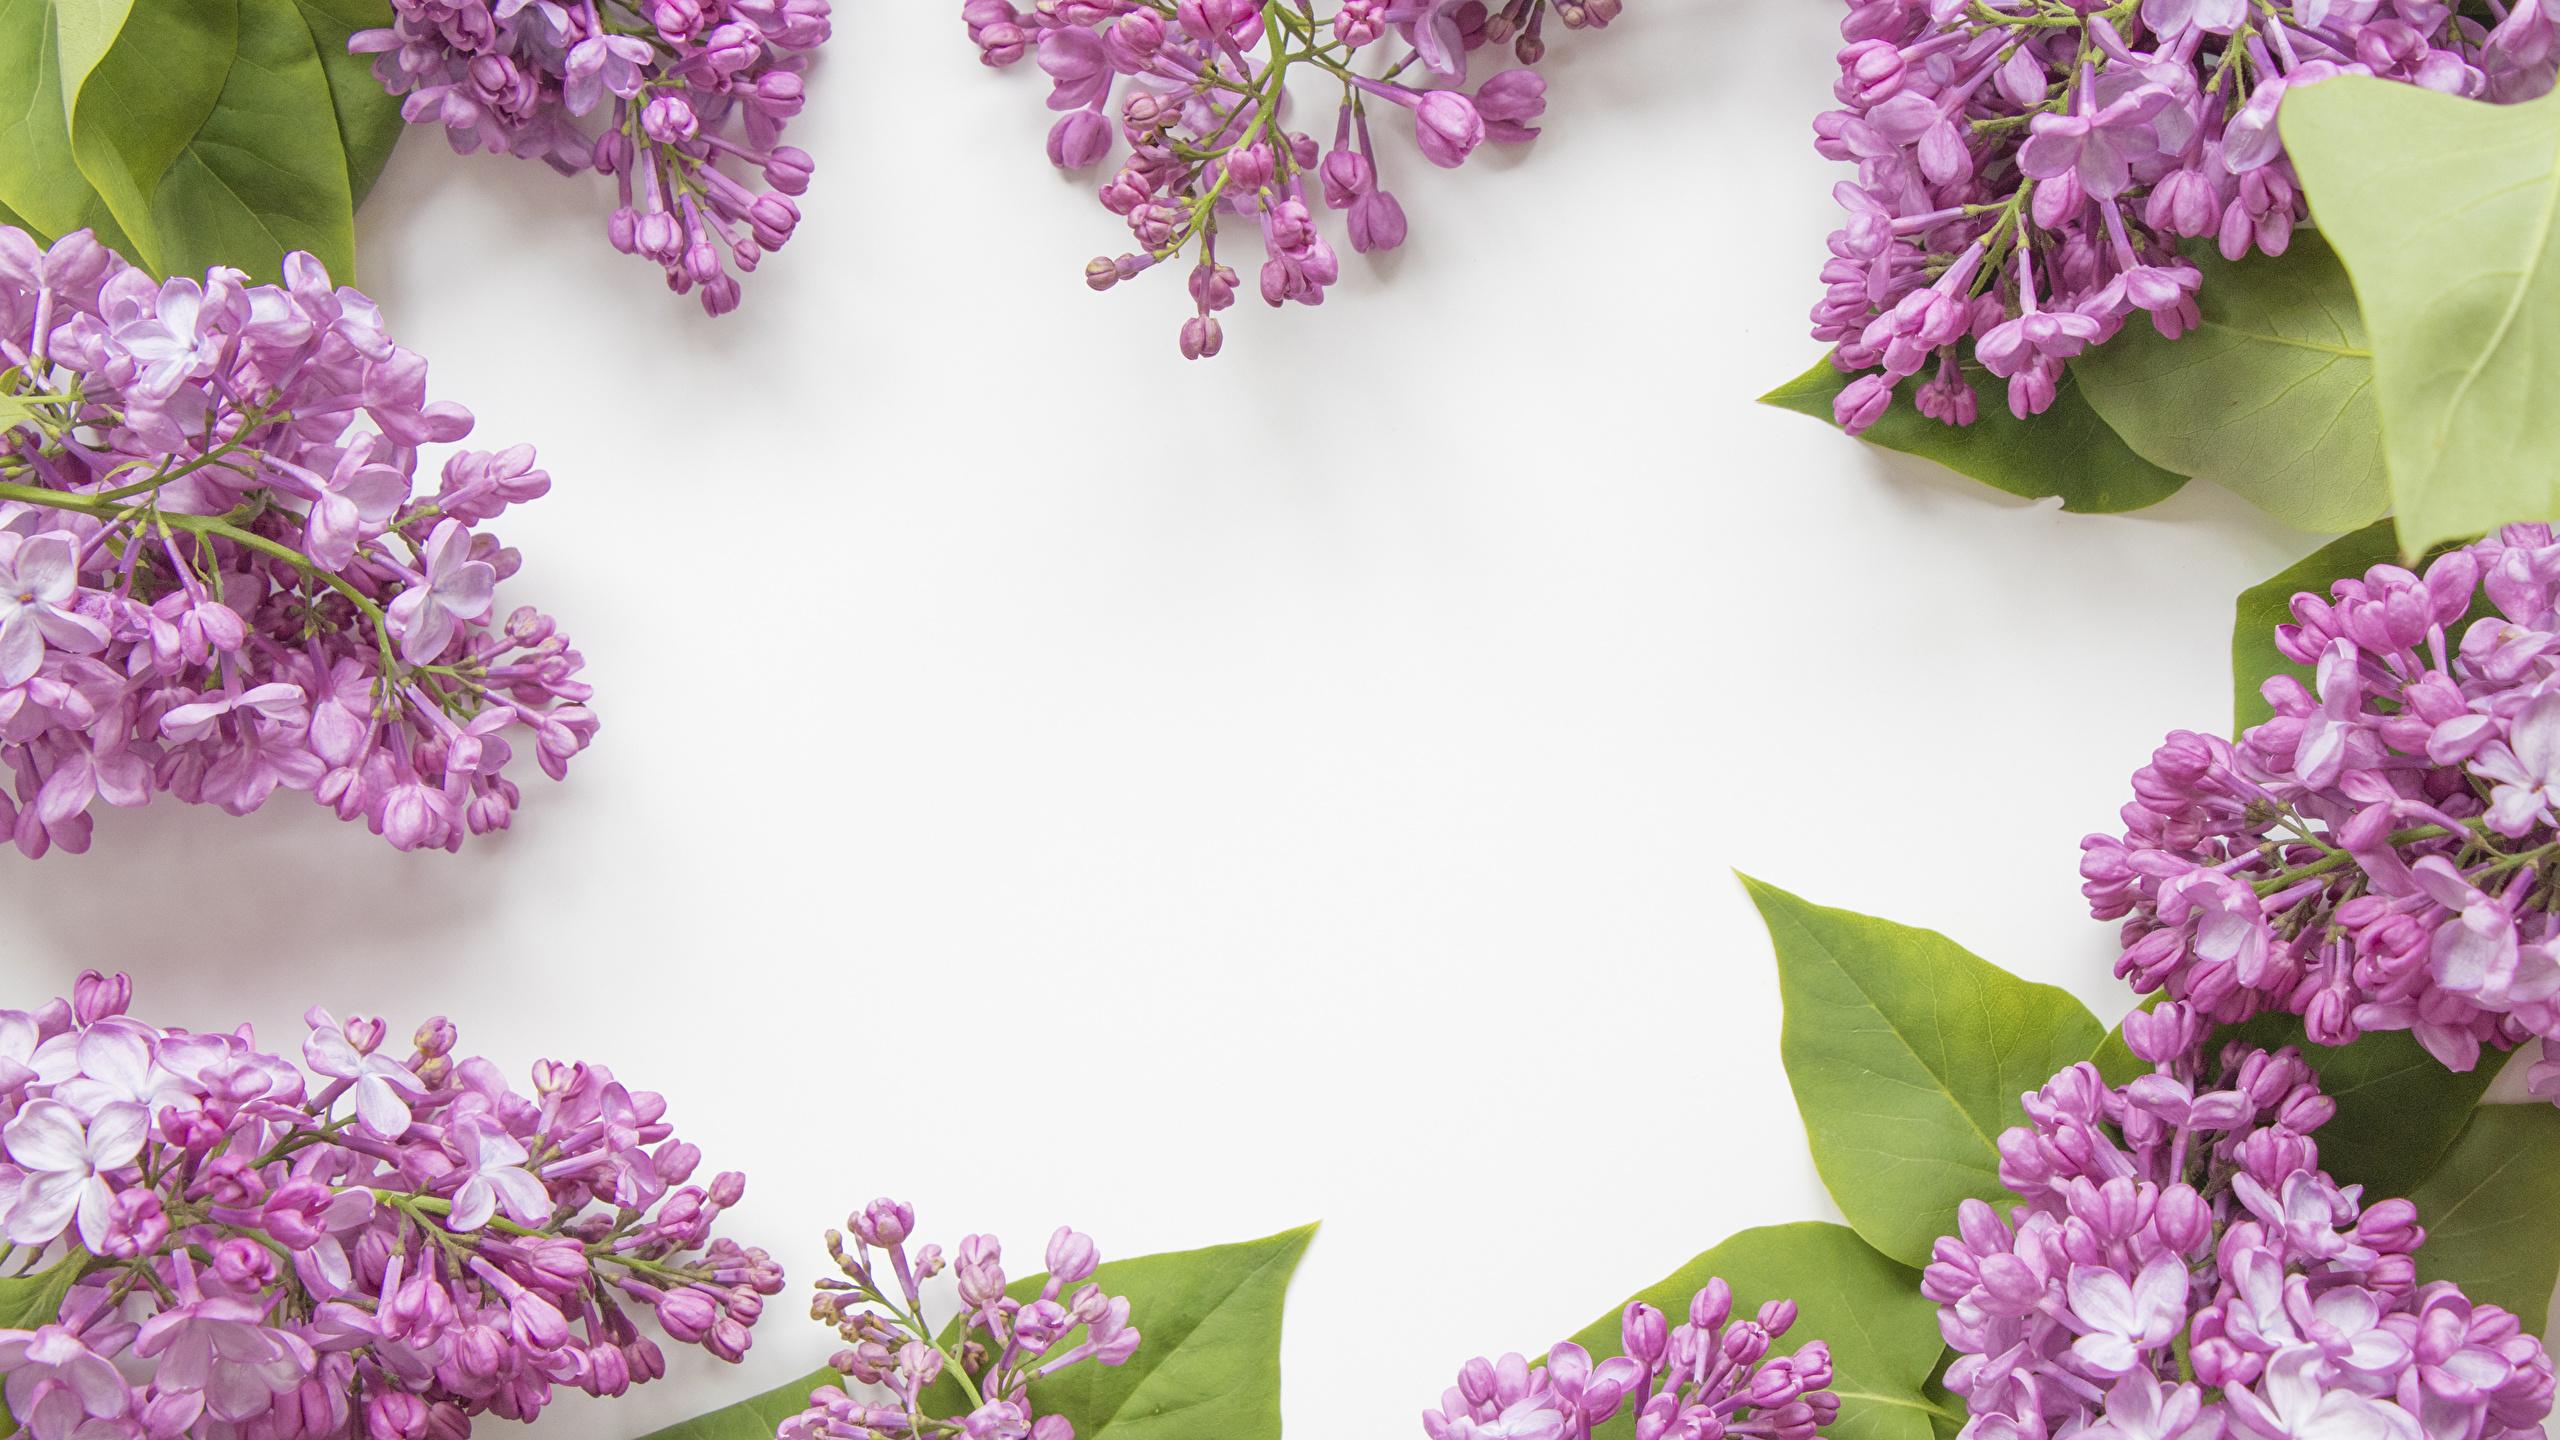 Fonds Decran 2560x1440 Syringa Fond Blanc Branche Fleurs